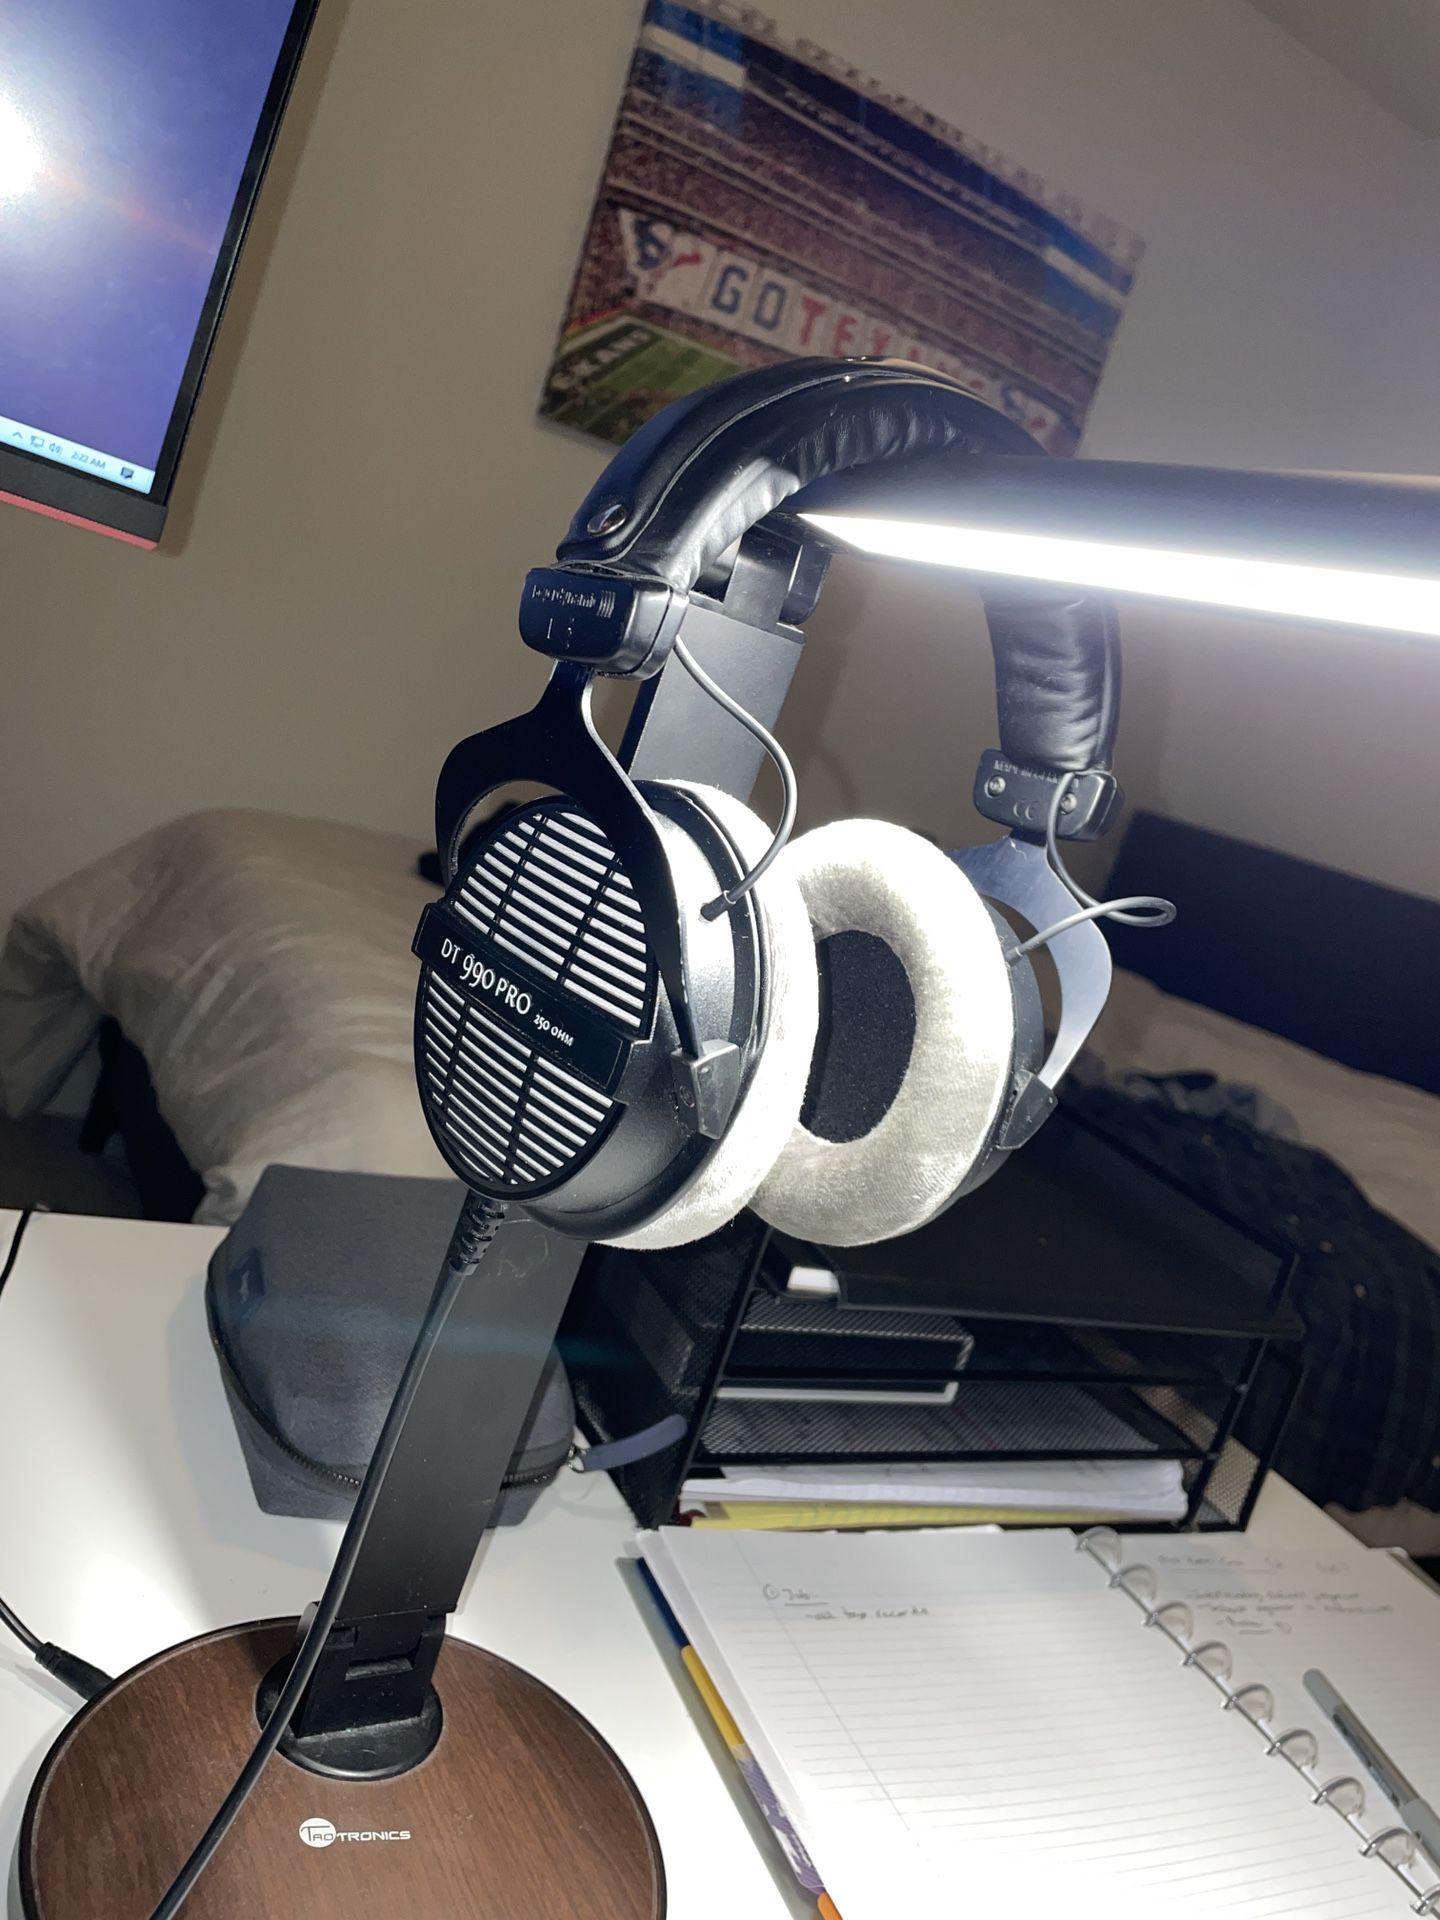 Beyerdynamic DT-990 Pro Studio Headphones